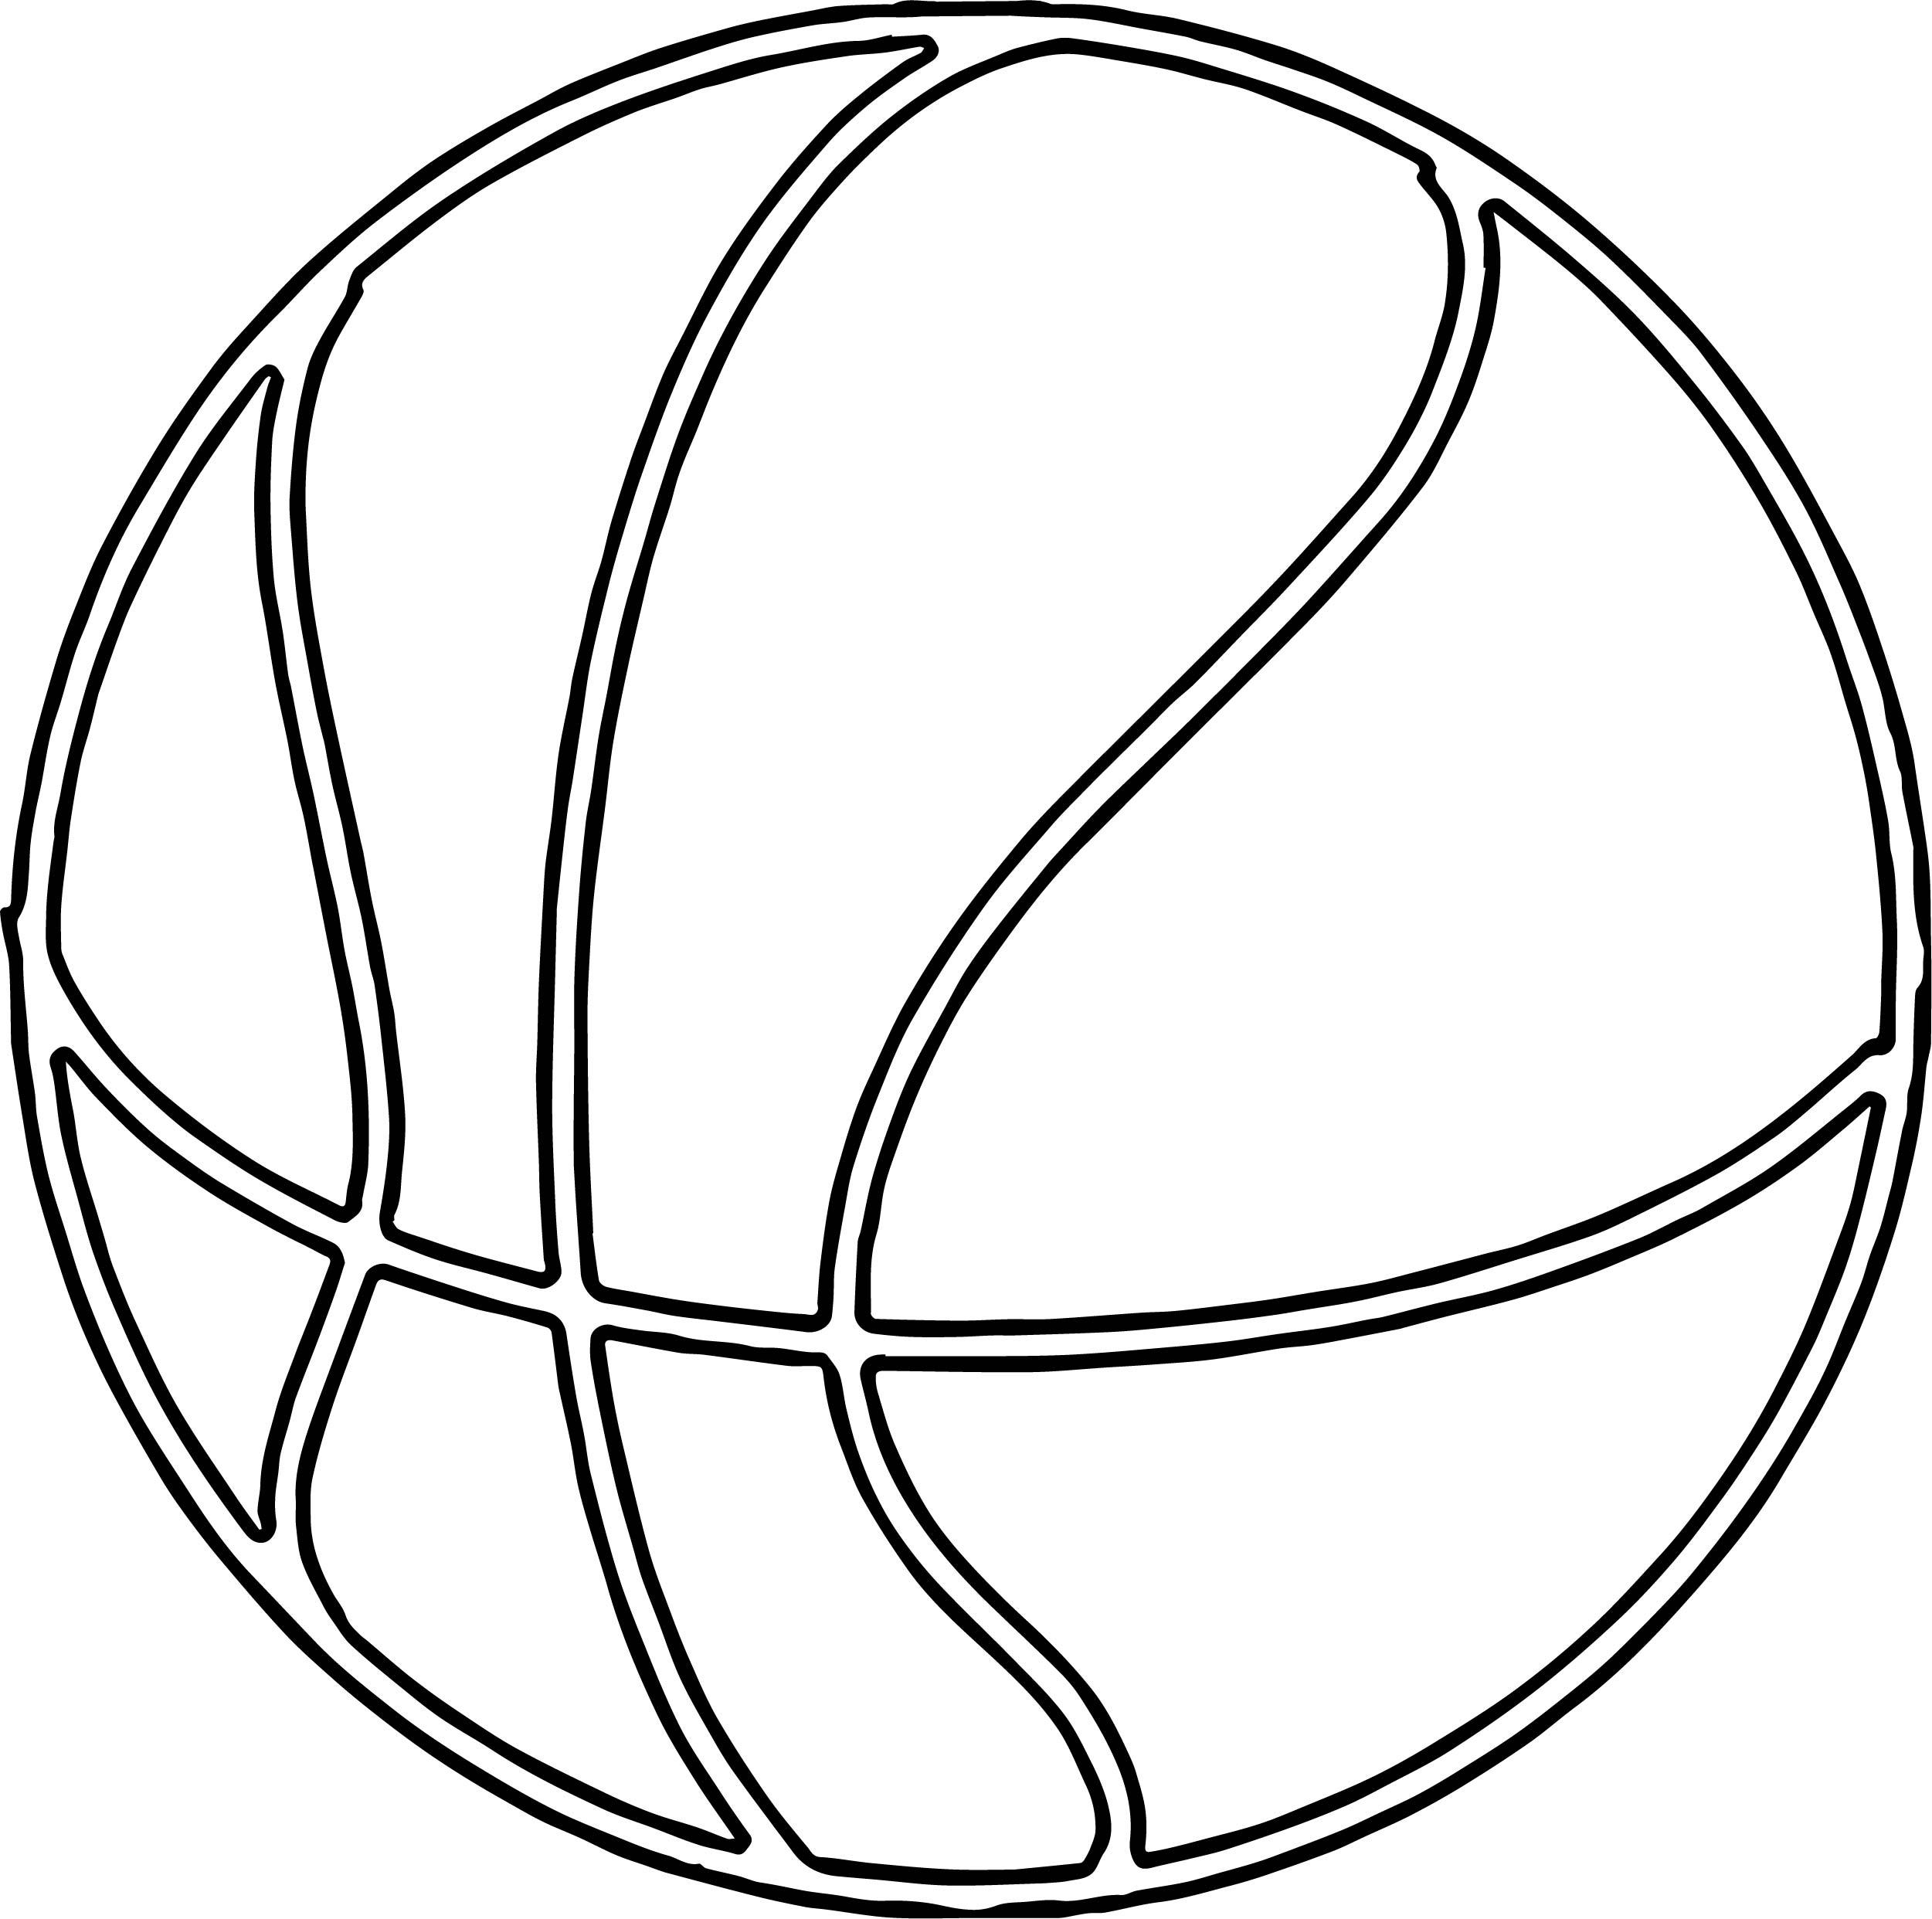 Basketball Outline